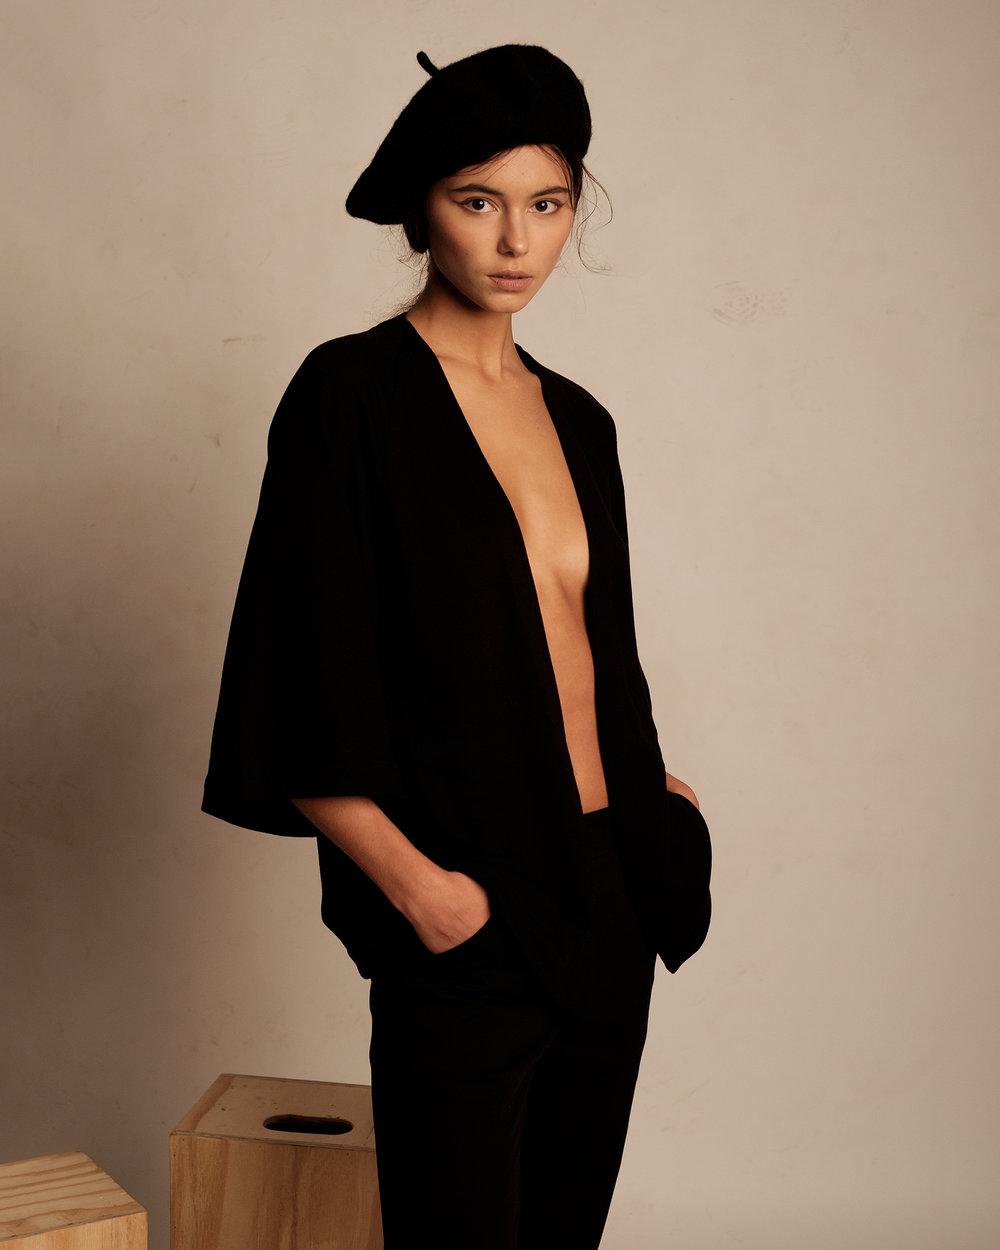 Photo: Oliver Moosus / Model: Alisa Grabovaja